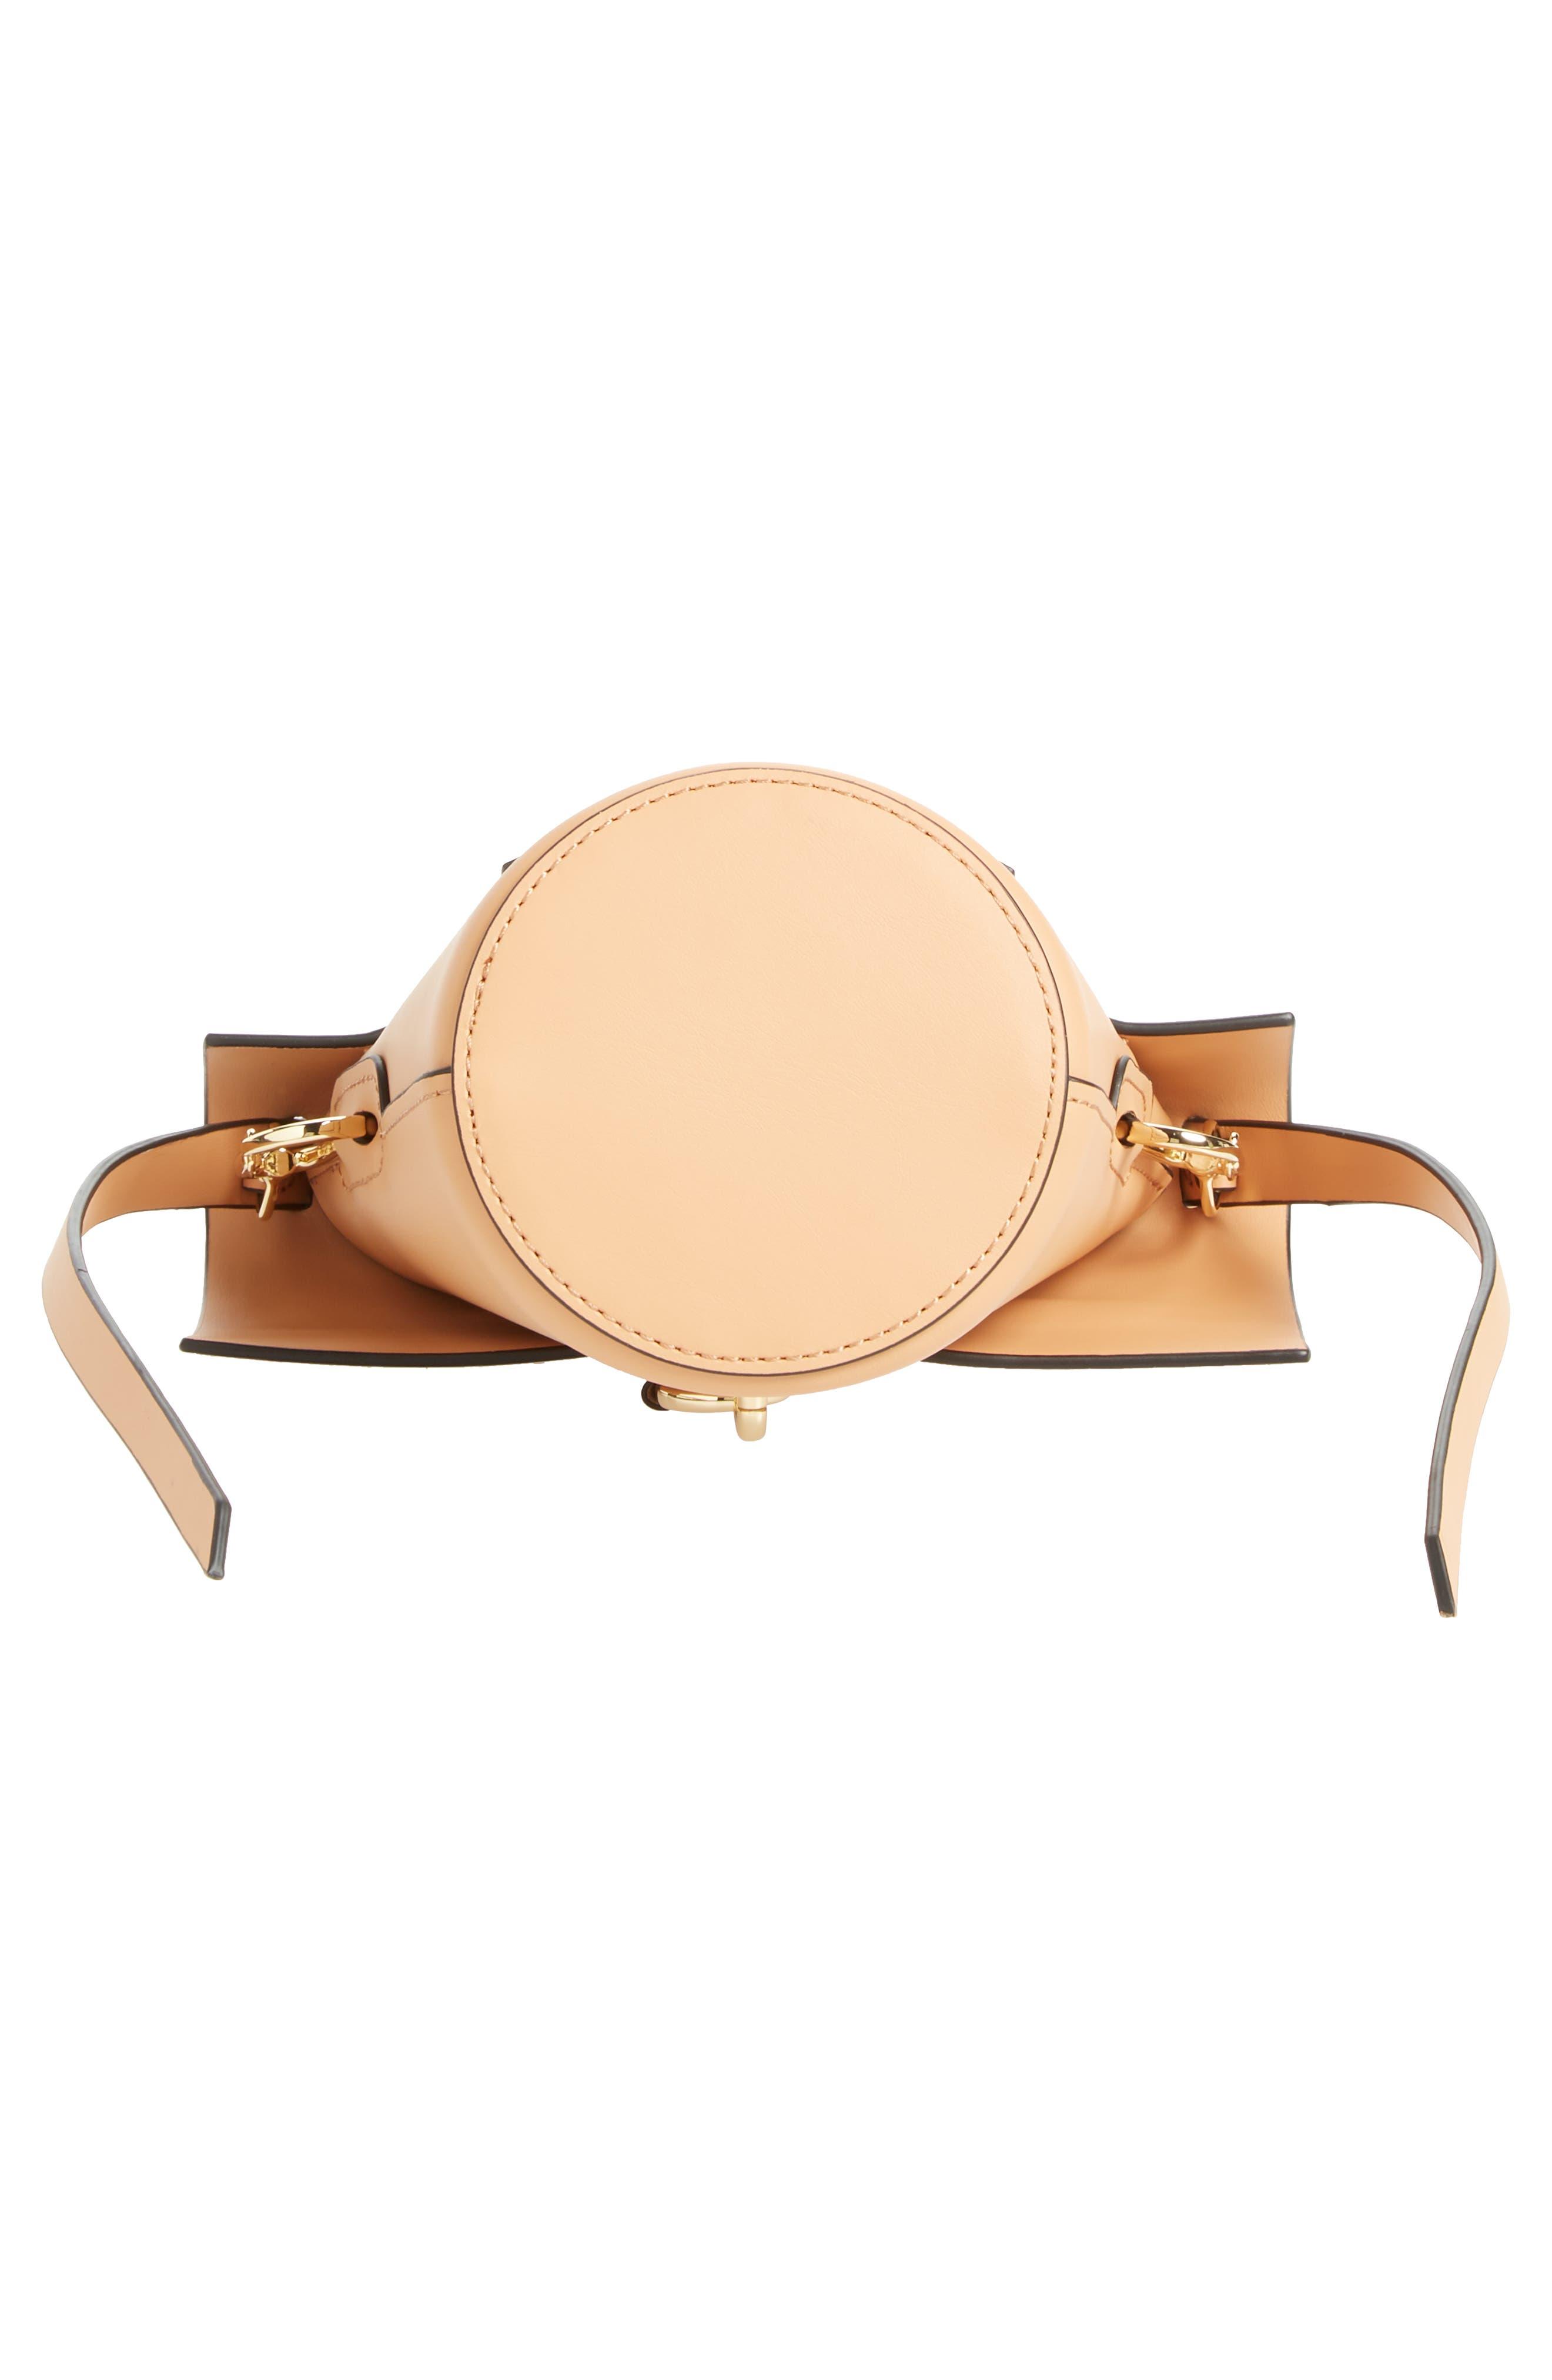 Mini Belay Calfskin Leather Crossbody Bucket Bag,                             Alternate thumbnail 6, color,                             Vachetta